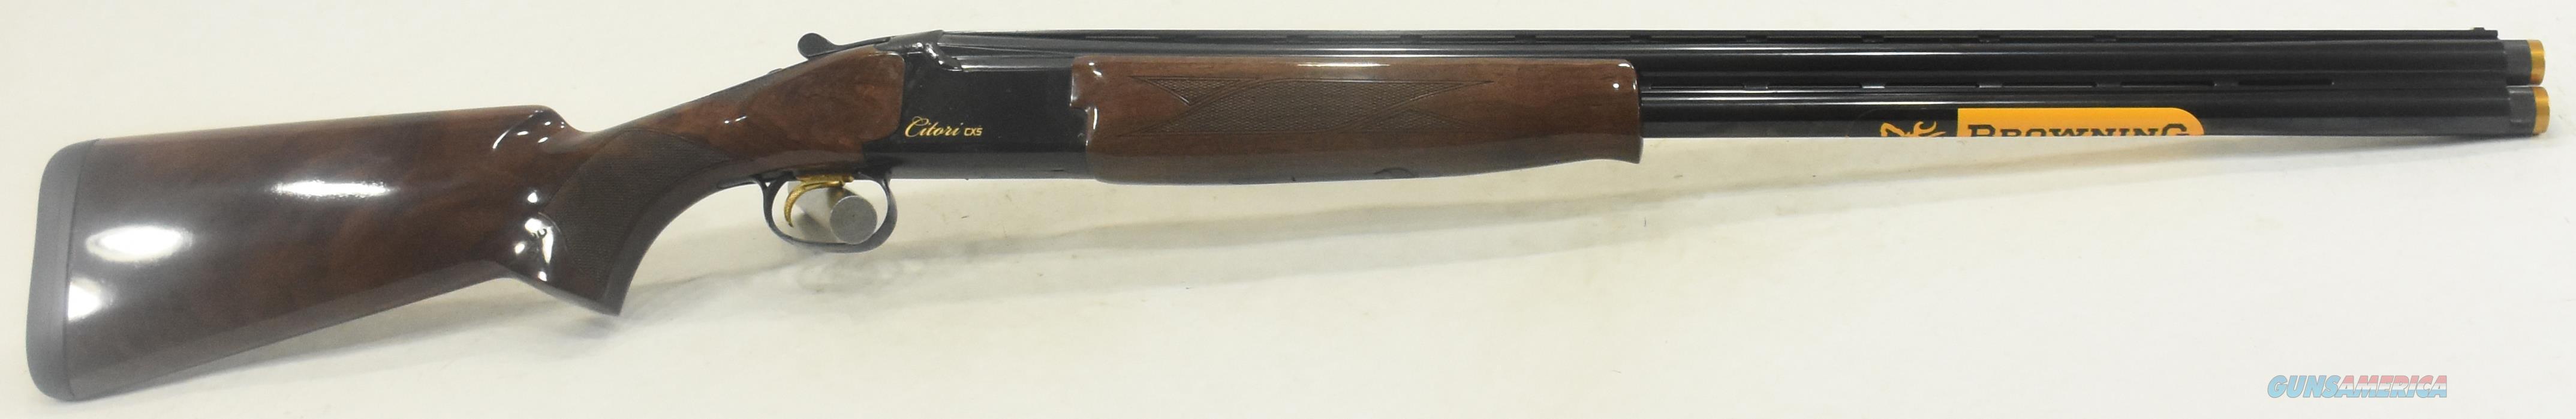 Citori CXS 12Ga 28-3In 018073304  Guns > Shotguns > Browning Shotguns > Over Unders > Citori > Hunting